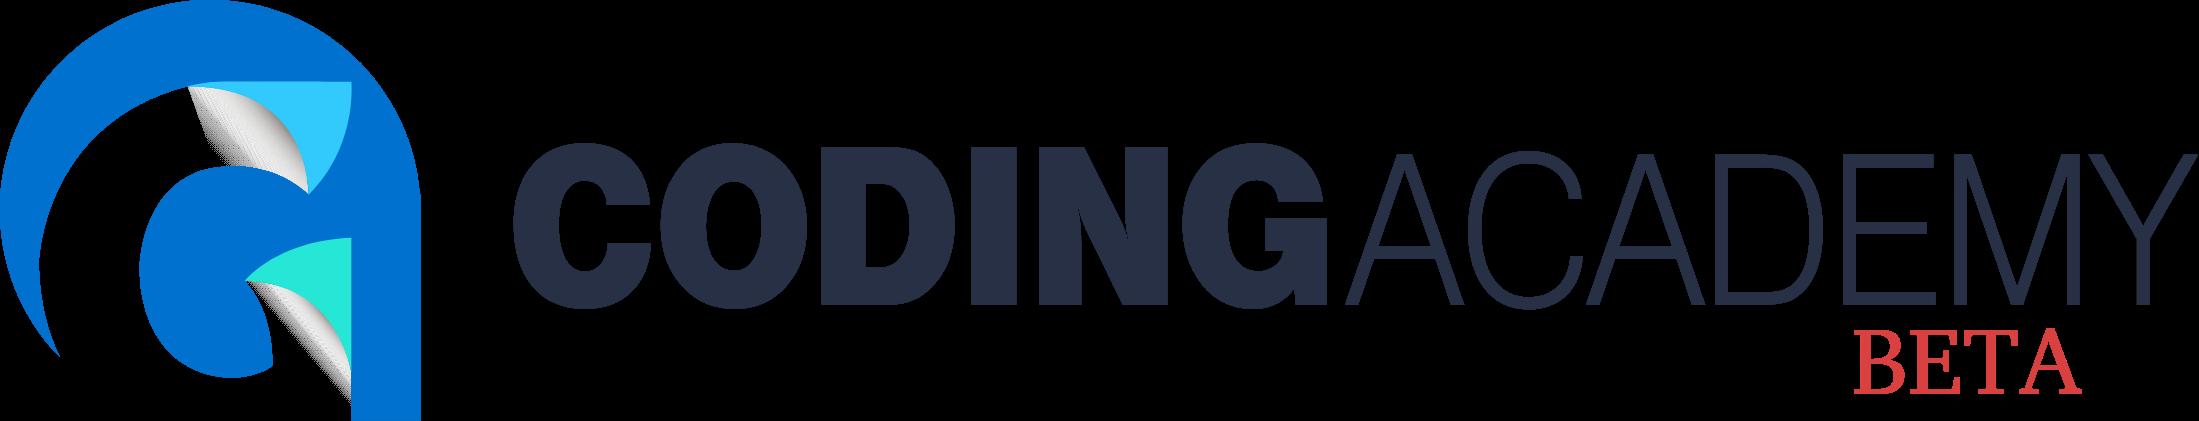 G Coding Academy